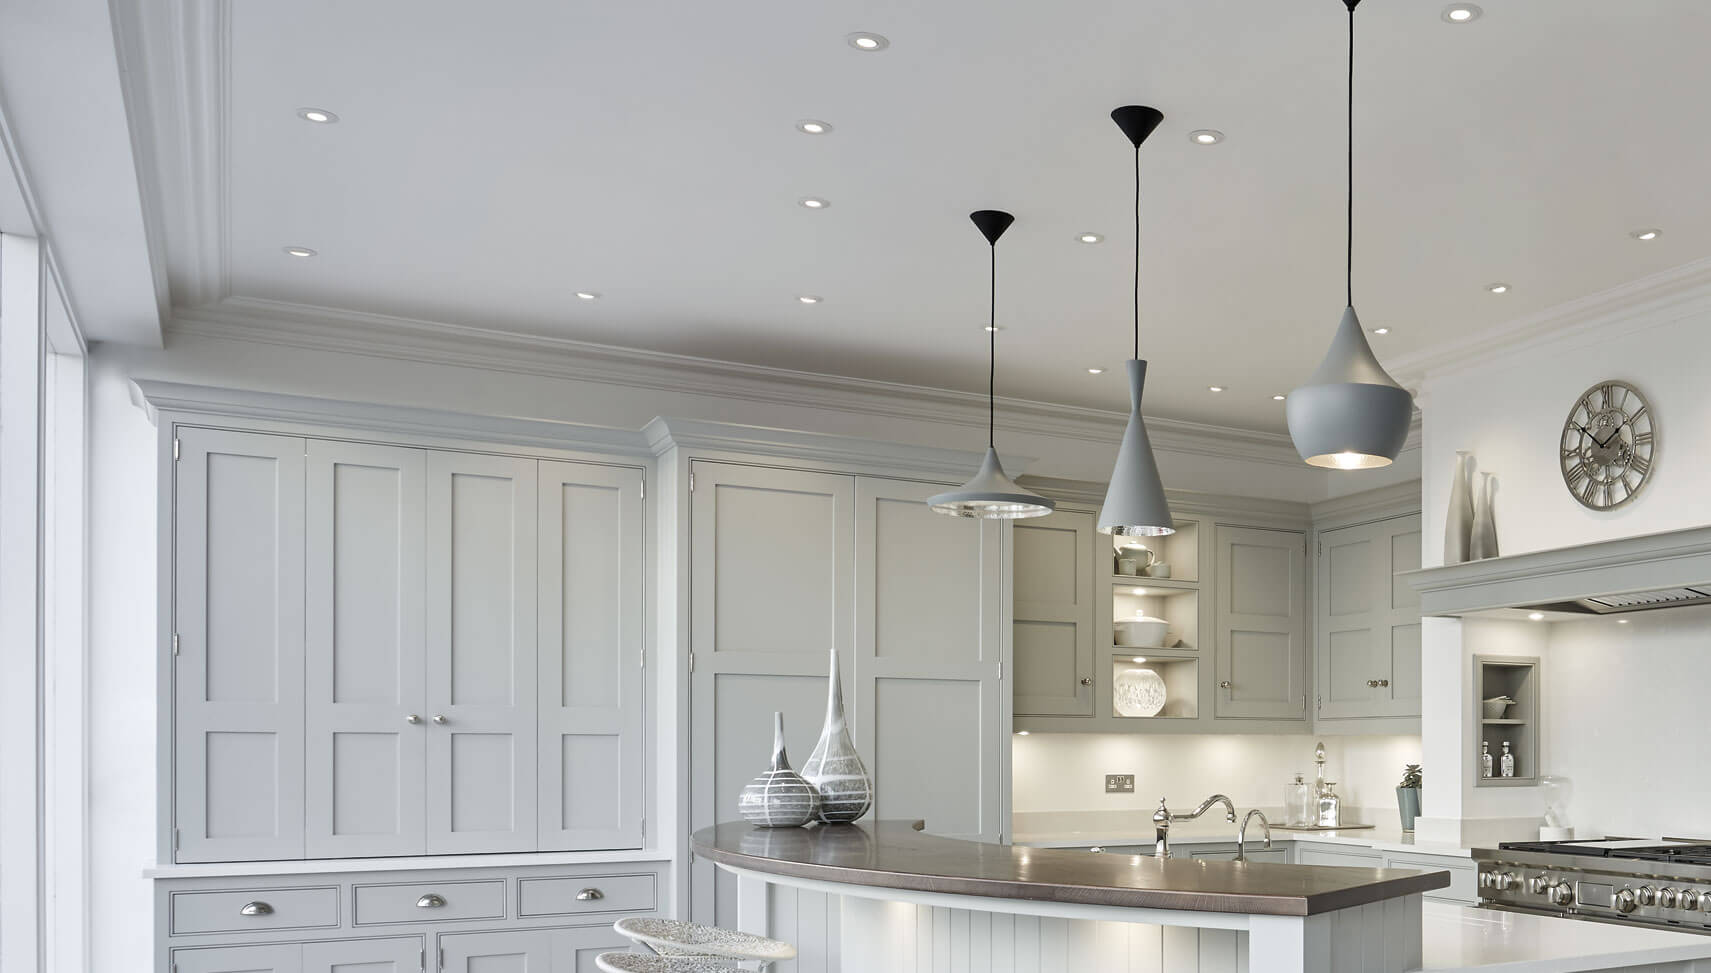 Pendant Lighting For The Kitchen Tom Howley